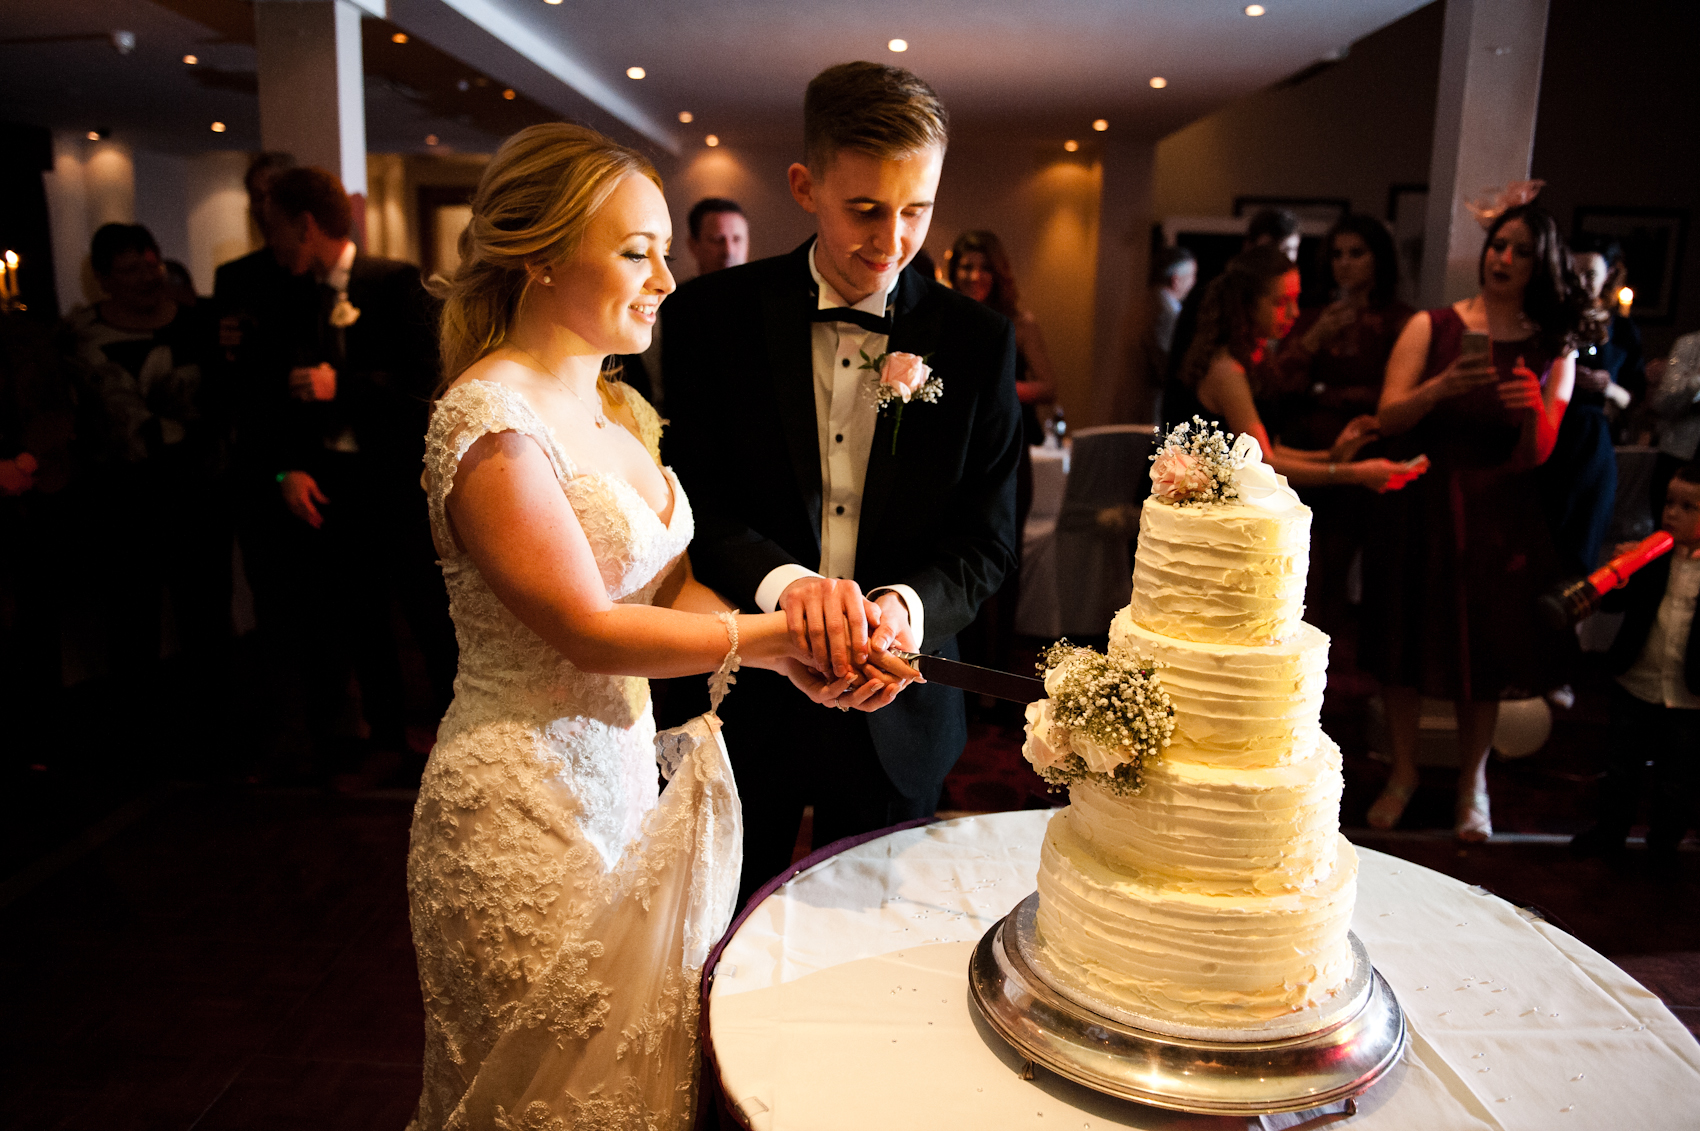 Declan & Emma wedding (28 of 29).jpg